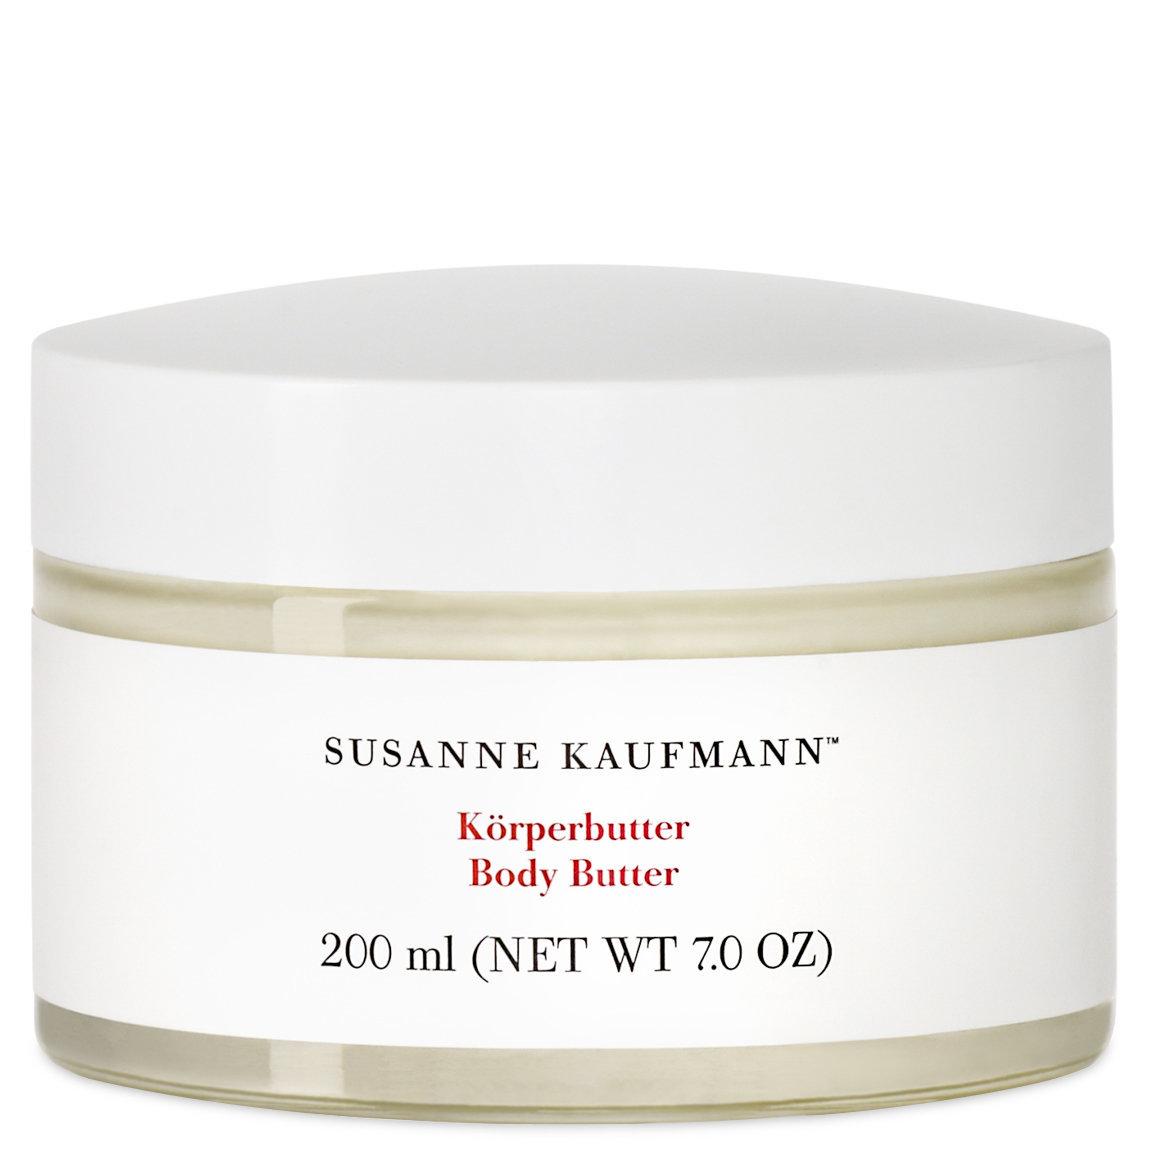 Susanne Kaufmann Body Butter alternative view 1 - product swatch.